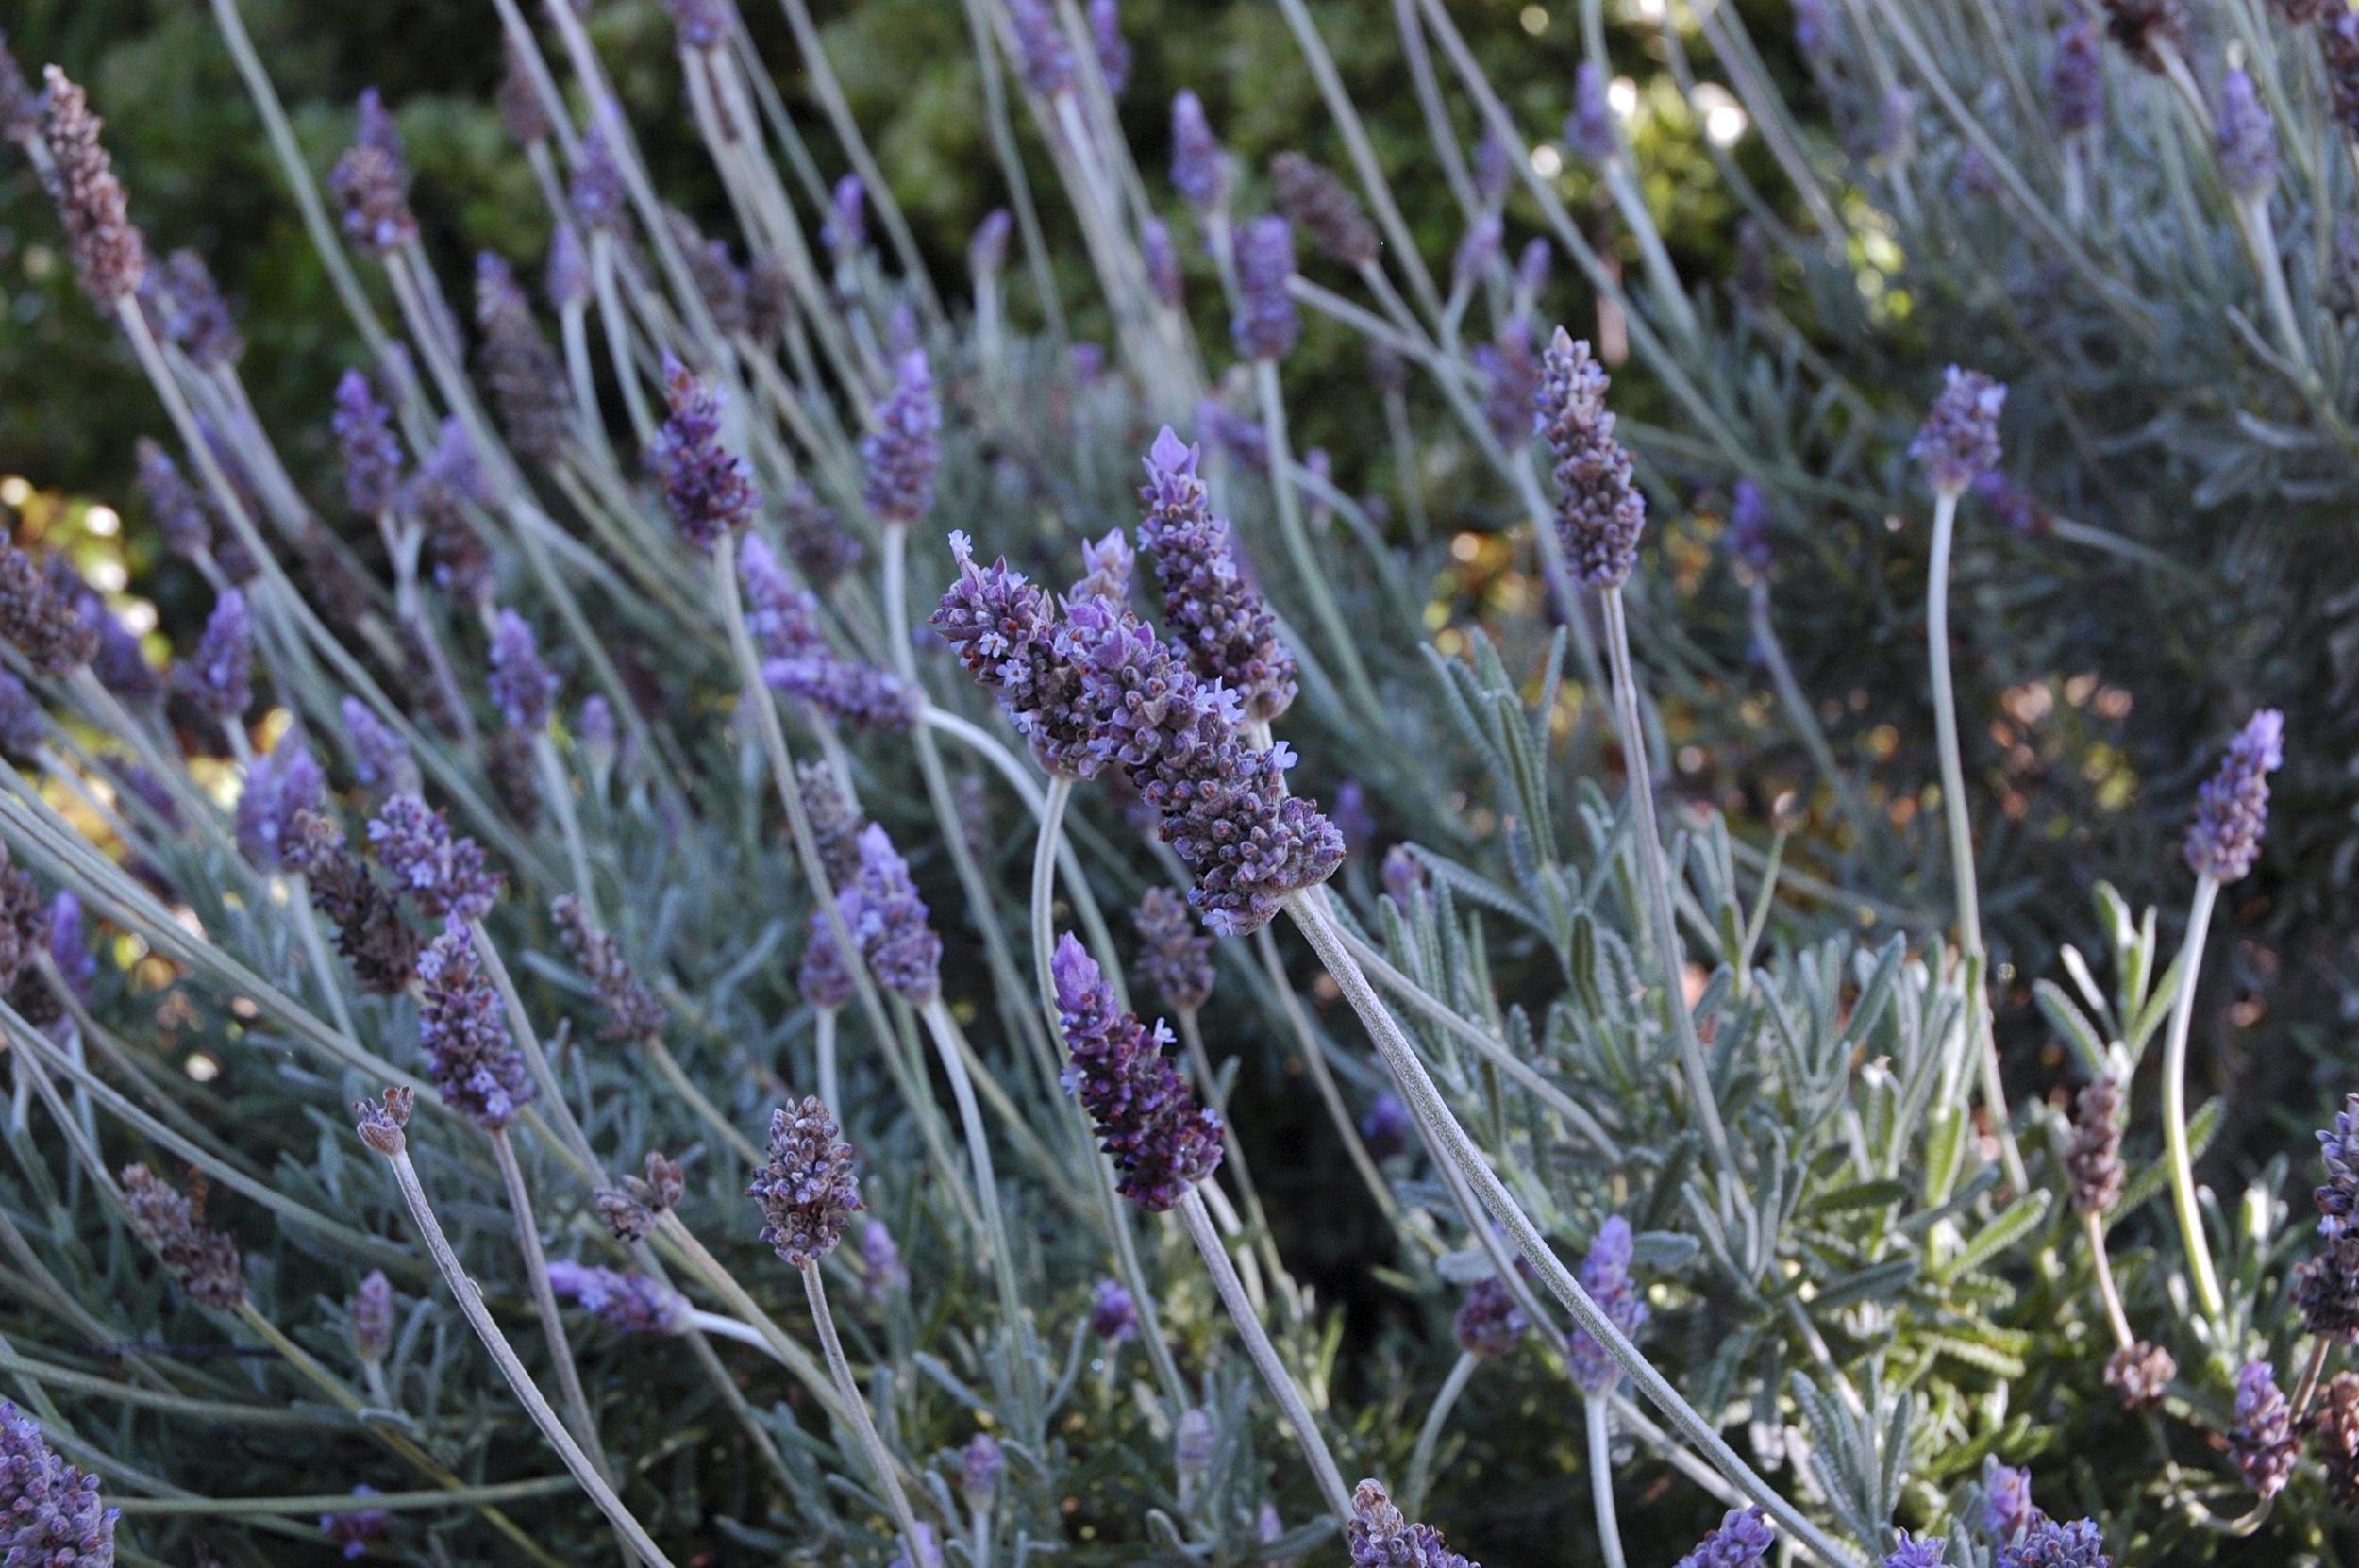 Lavender flowers by Alexis J. Cunningfolk